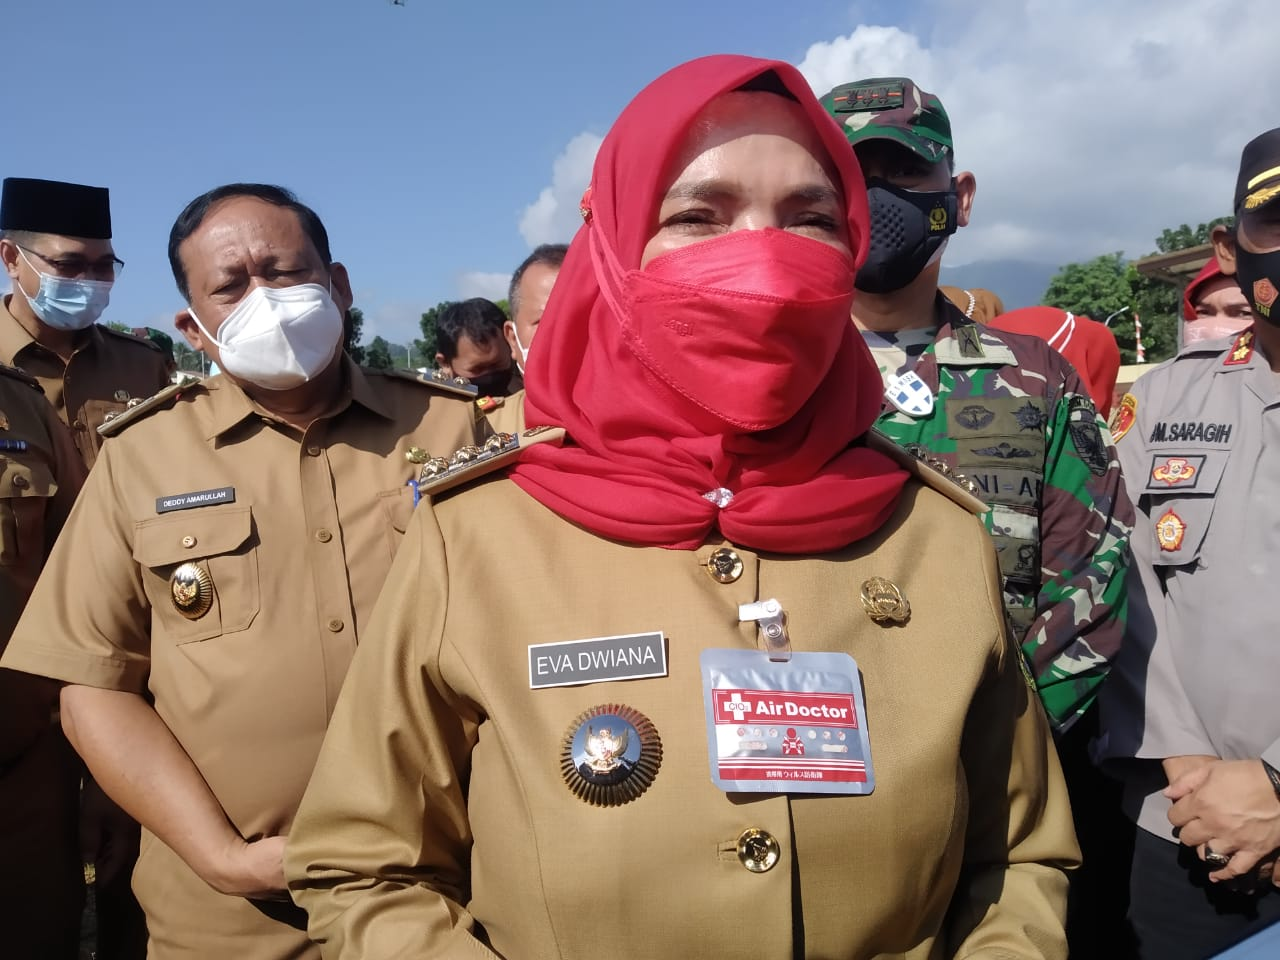 Walikota Eva Dwiana Angkat Bicara Terkait Dugaan Pemalsuan Tanda Tangan Camat Enggal